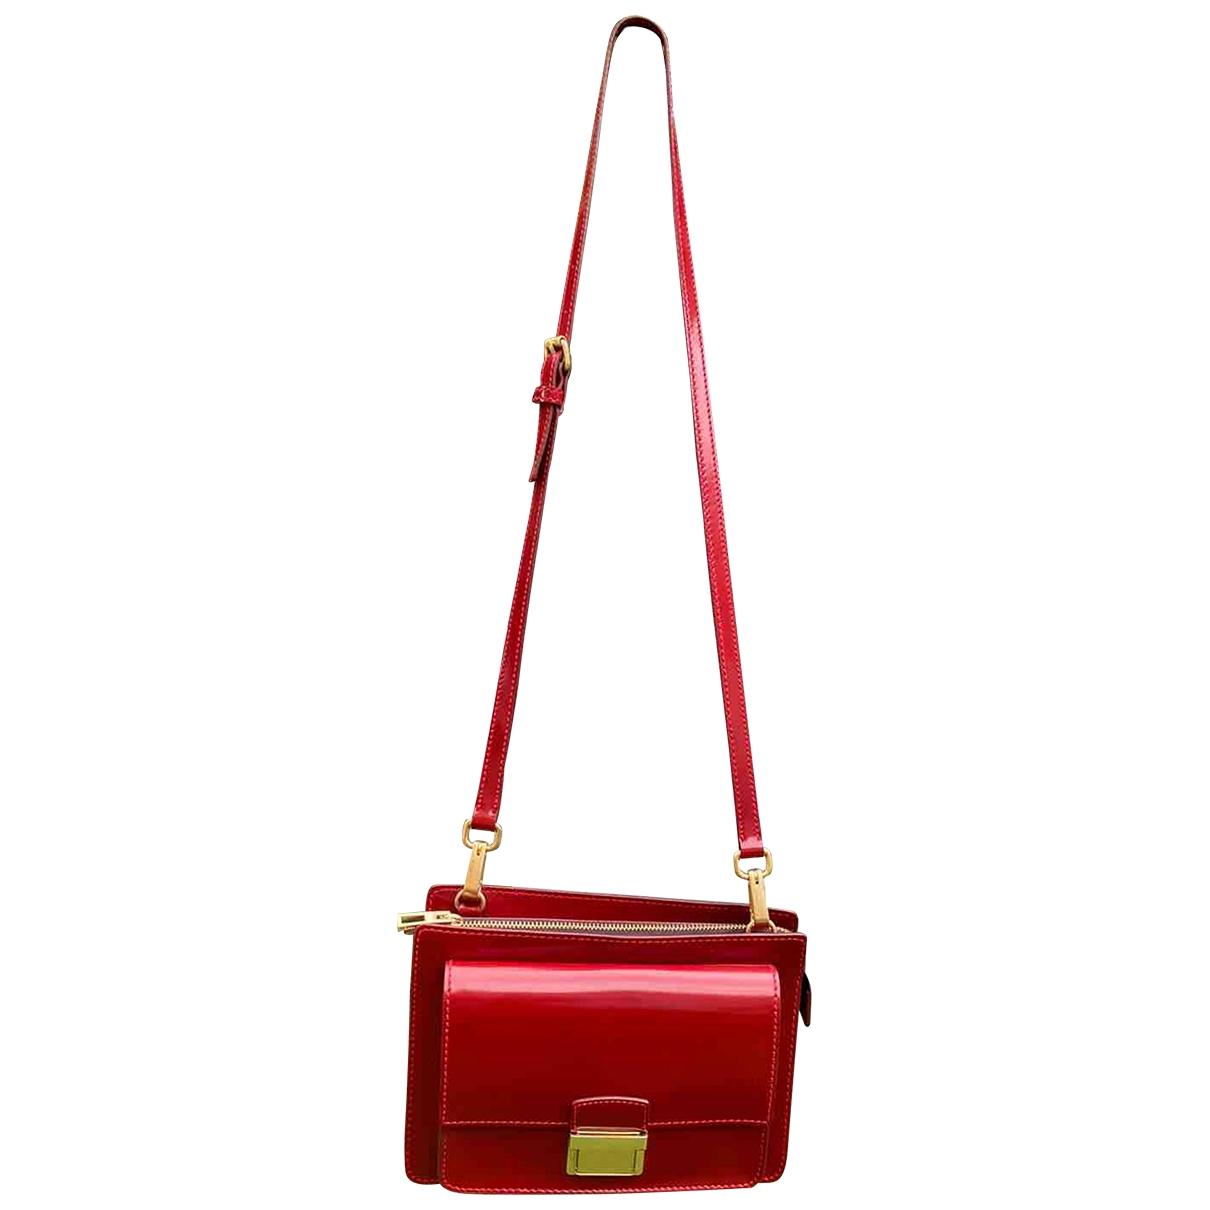 Bimba Y Lola \N Handtasche in  Rot Lackleder